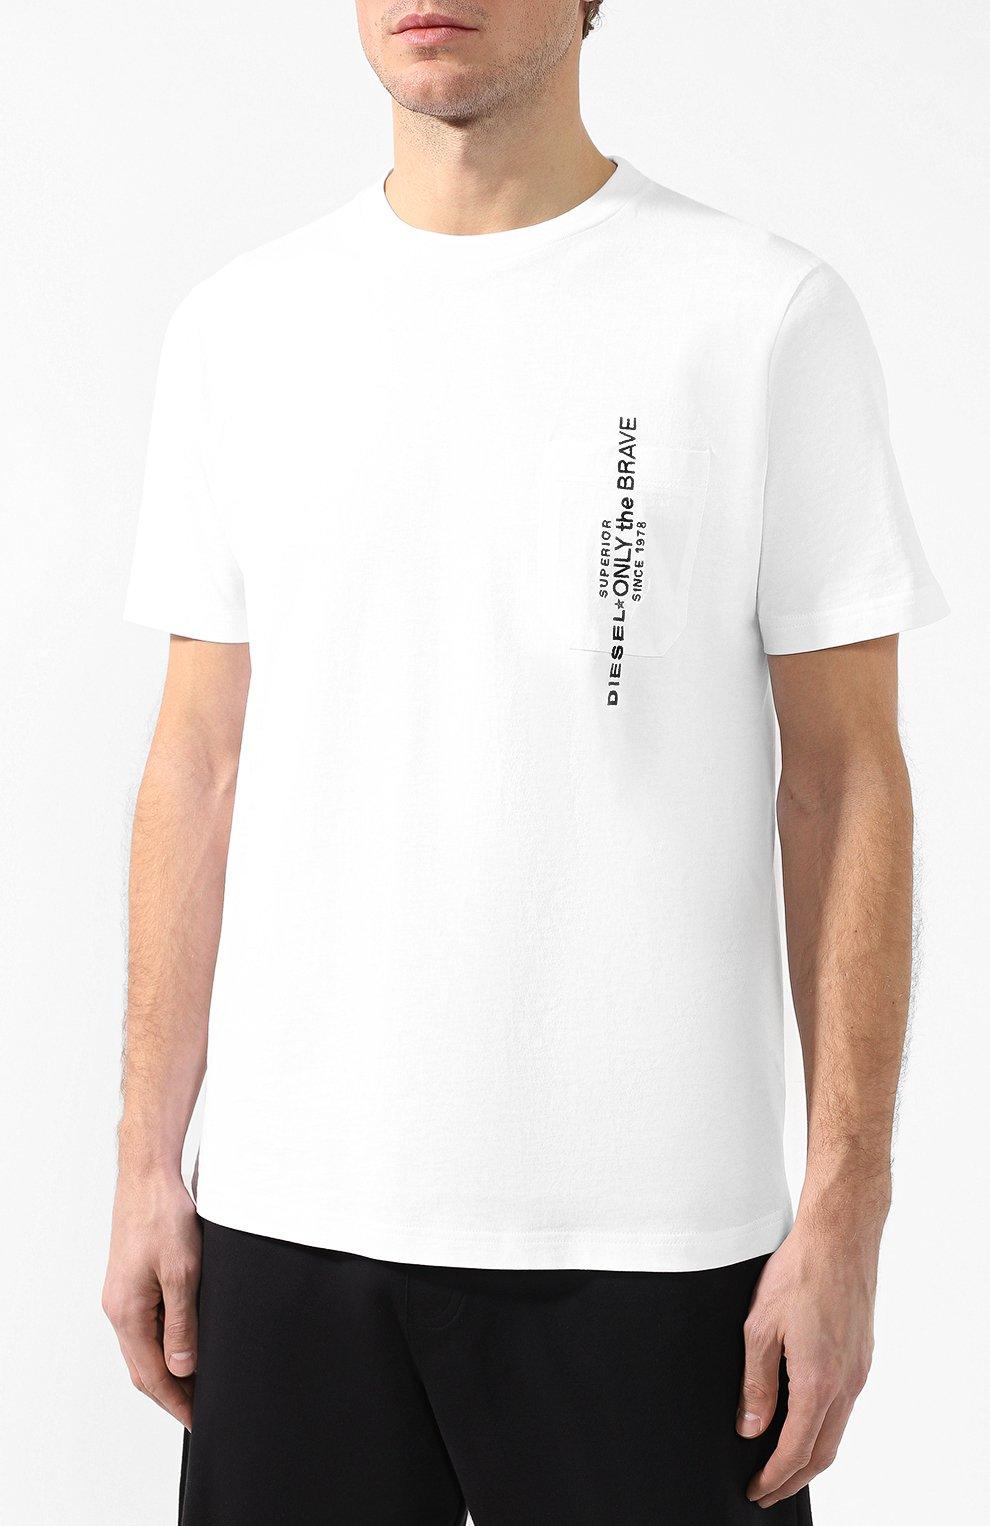 Хлопковая футболка Diesel белая | Фото №3